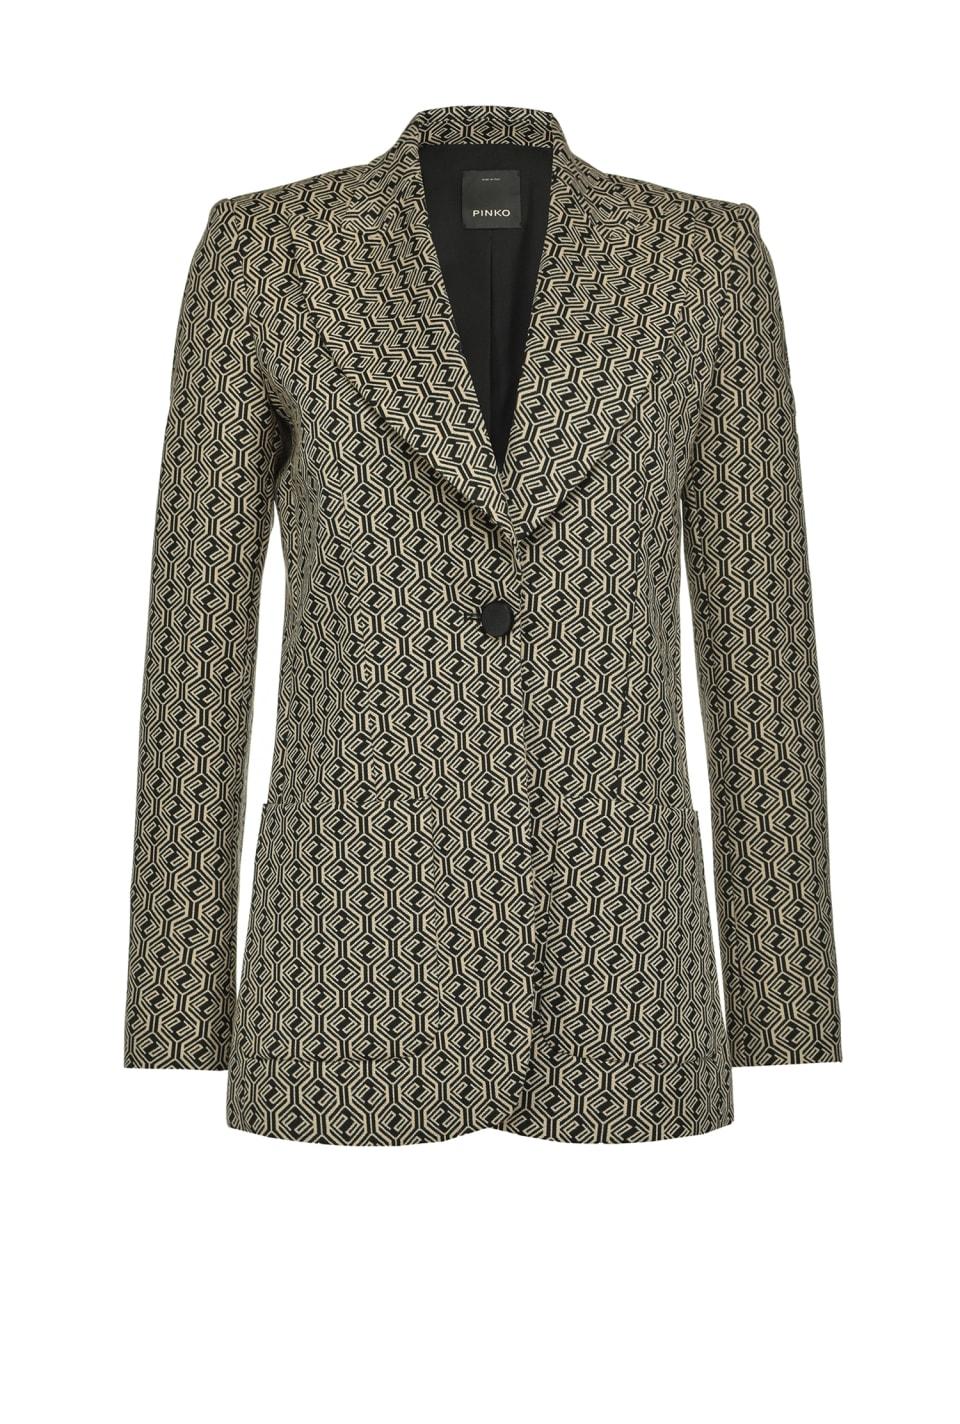 1970s long jacquard blazer - Pinko